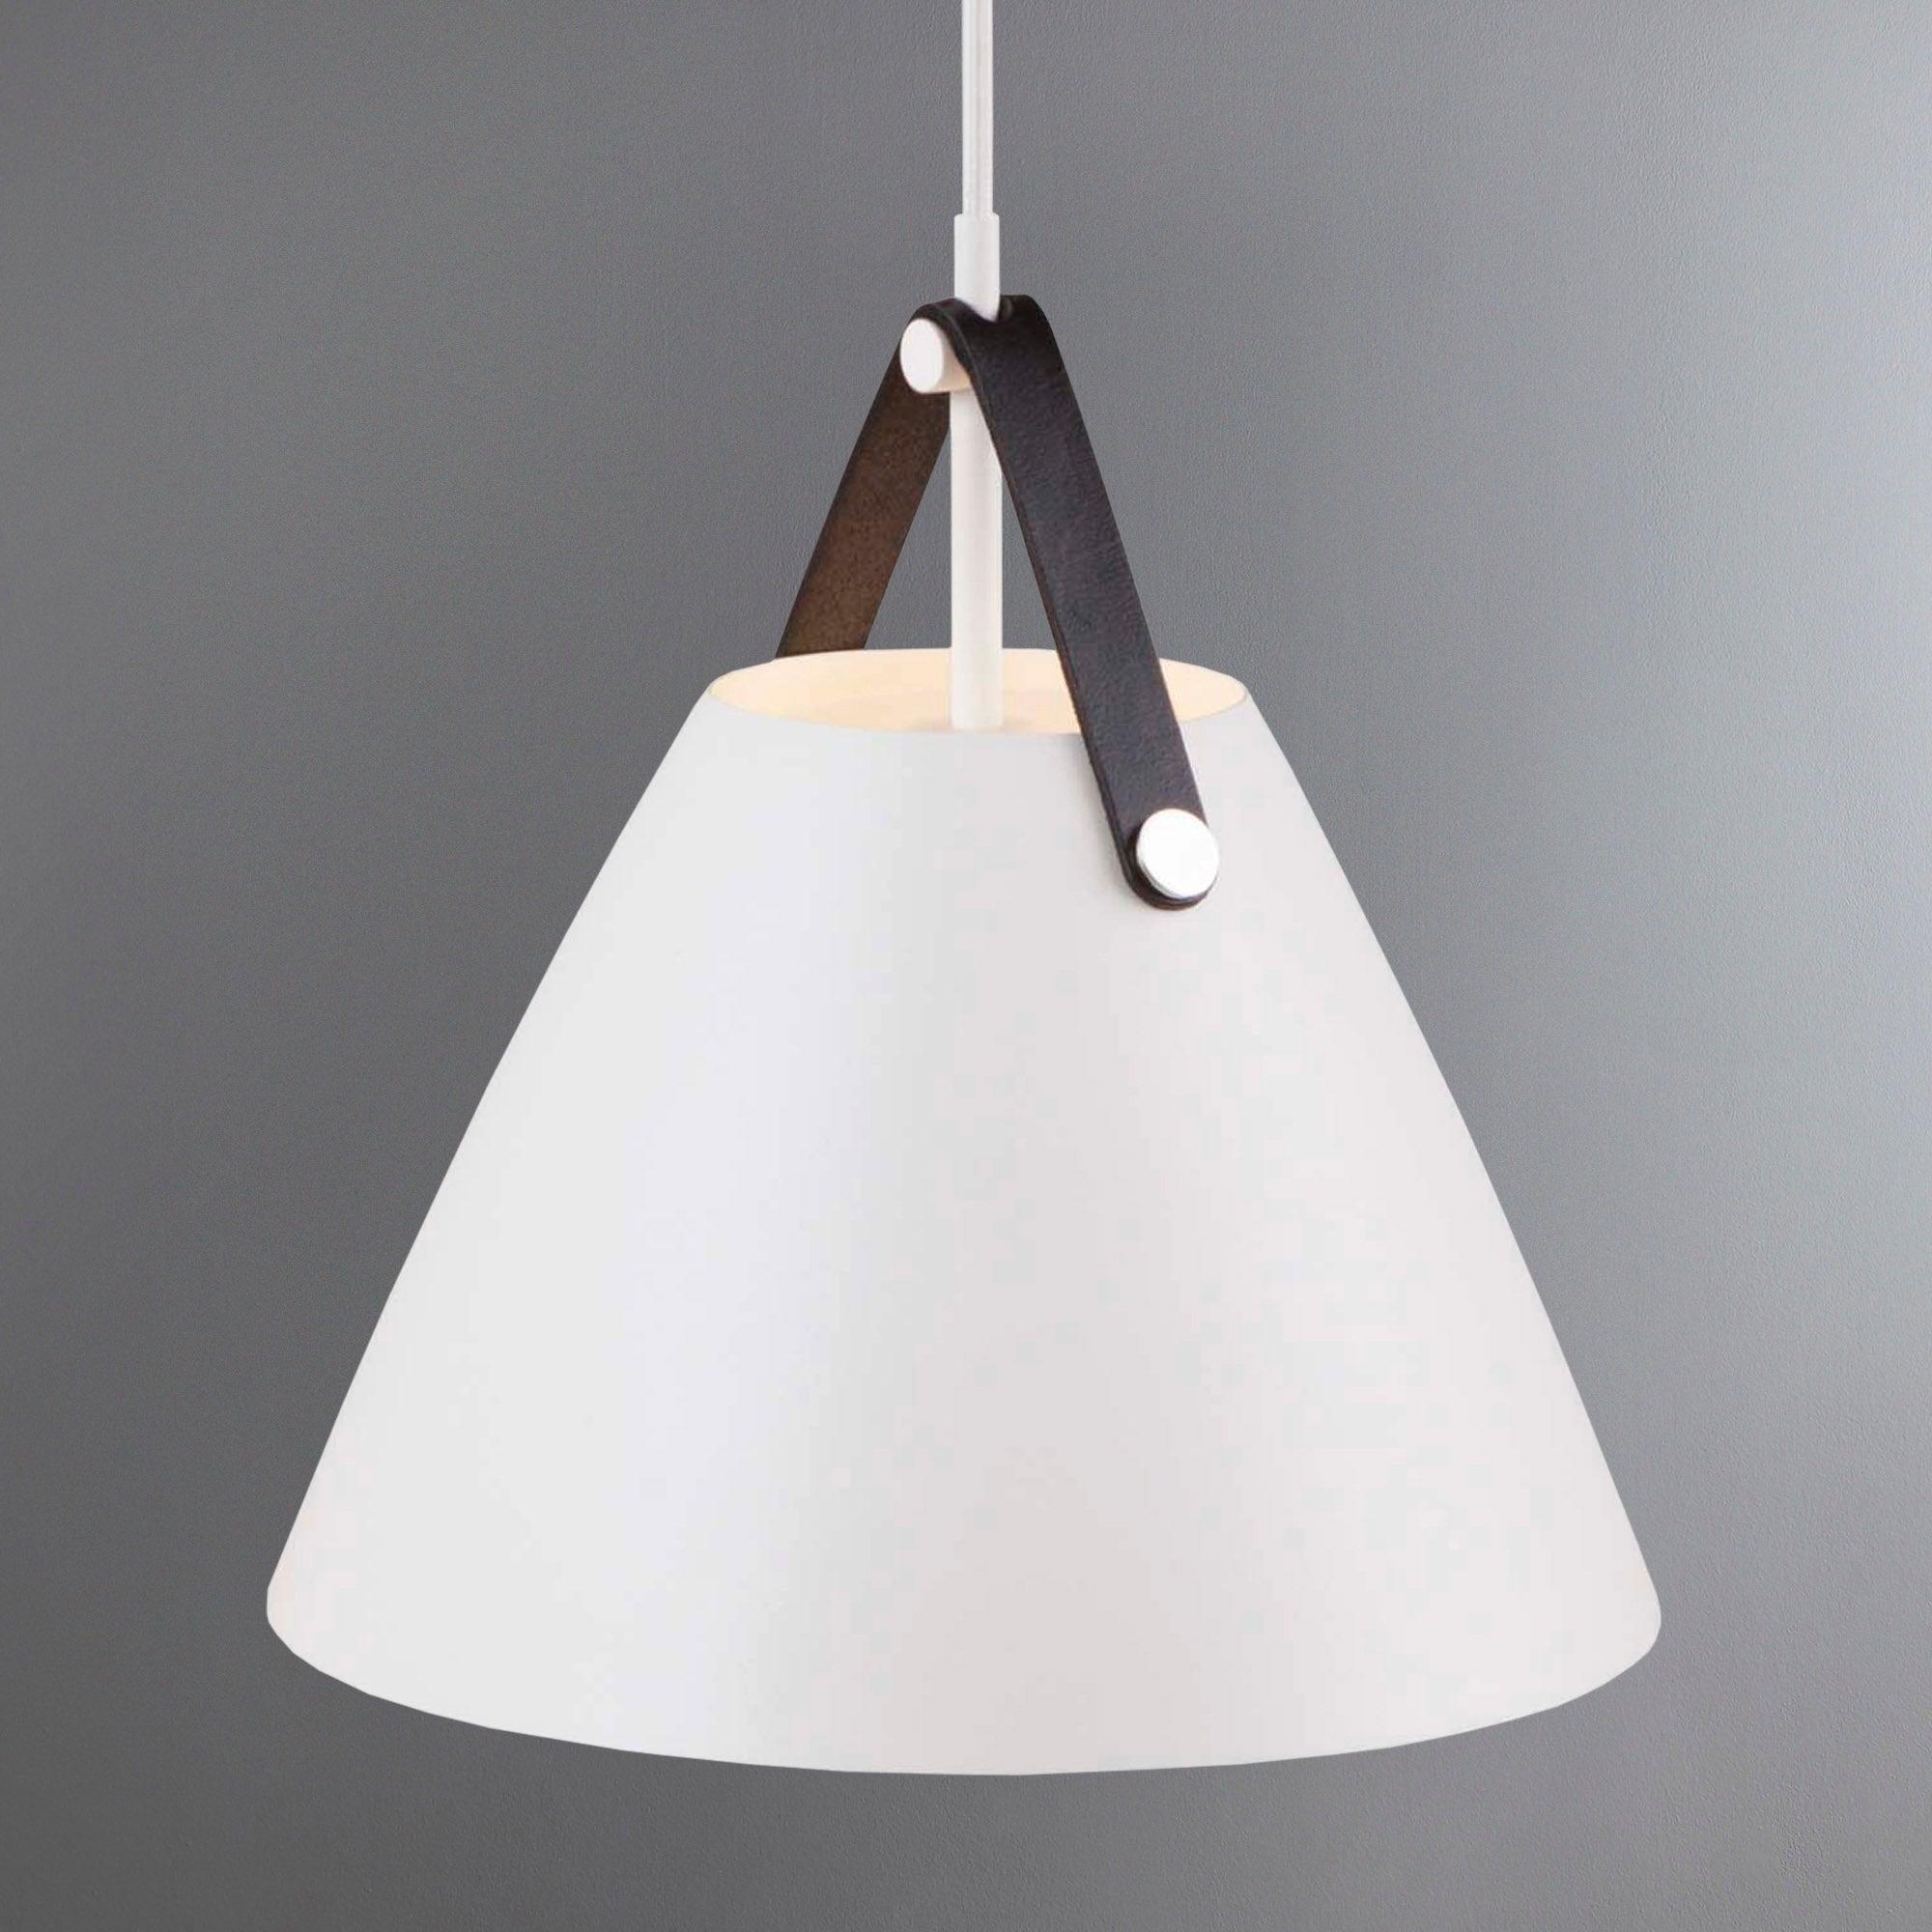 Photo of Strap small white pendant light fitting white